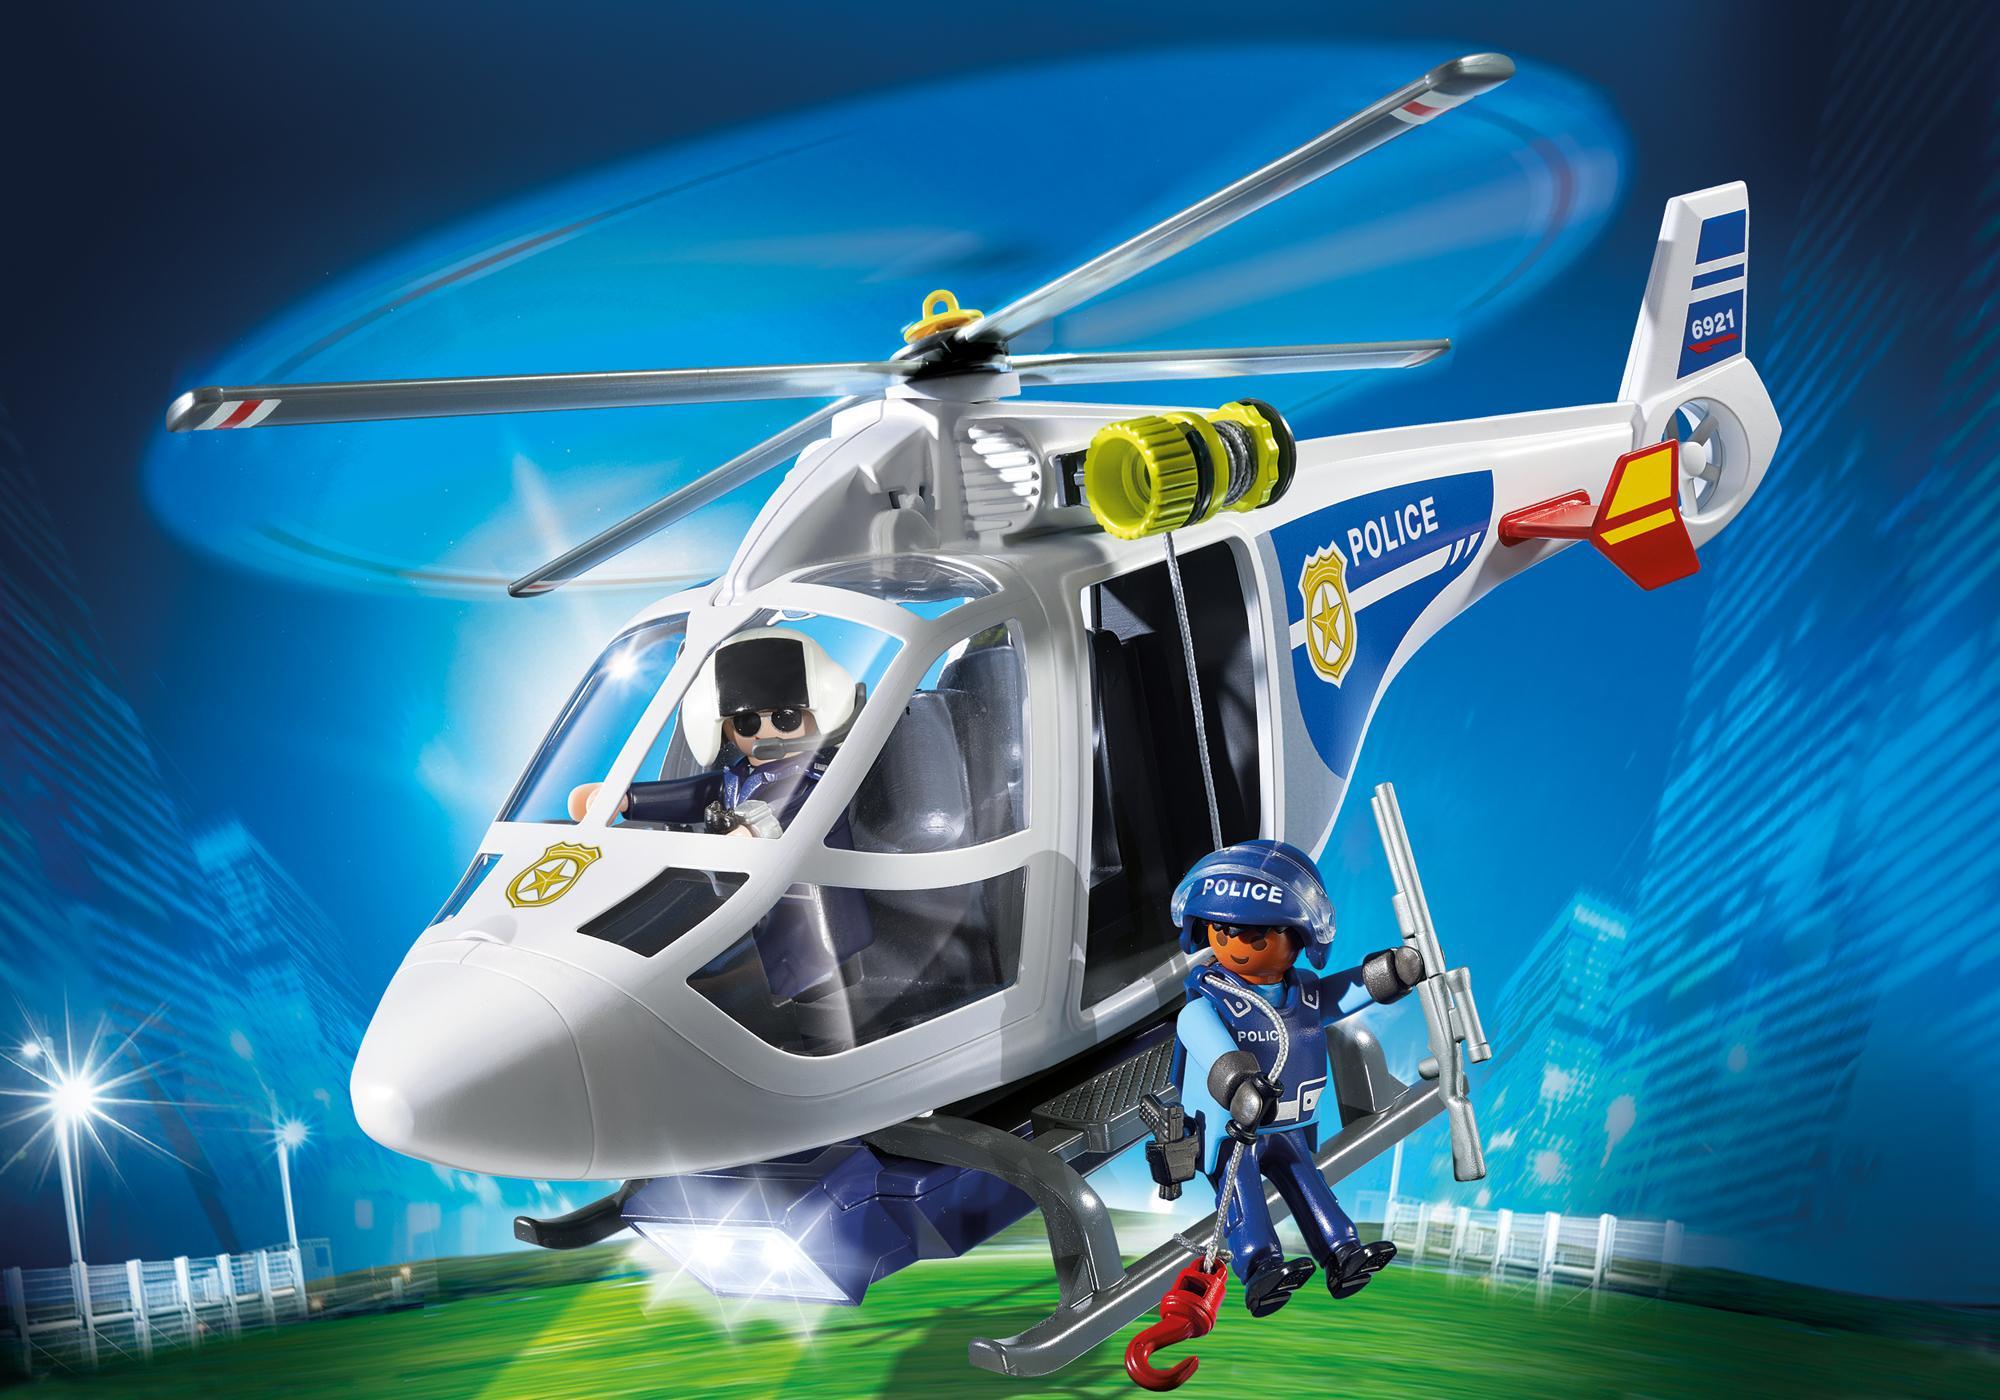 http://media.playmobil.com/i/playmobil/6921_product_detail/Helikopter policyjny z reflektorem LED